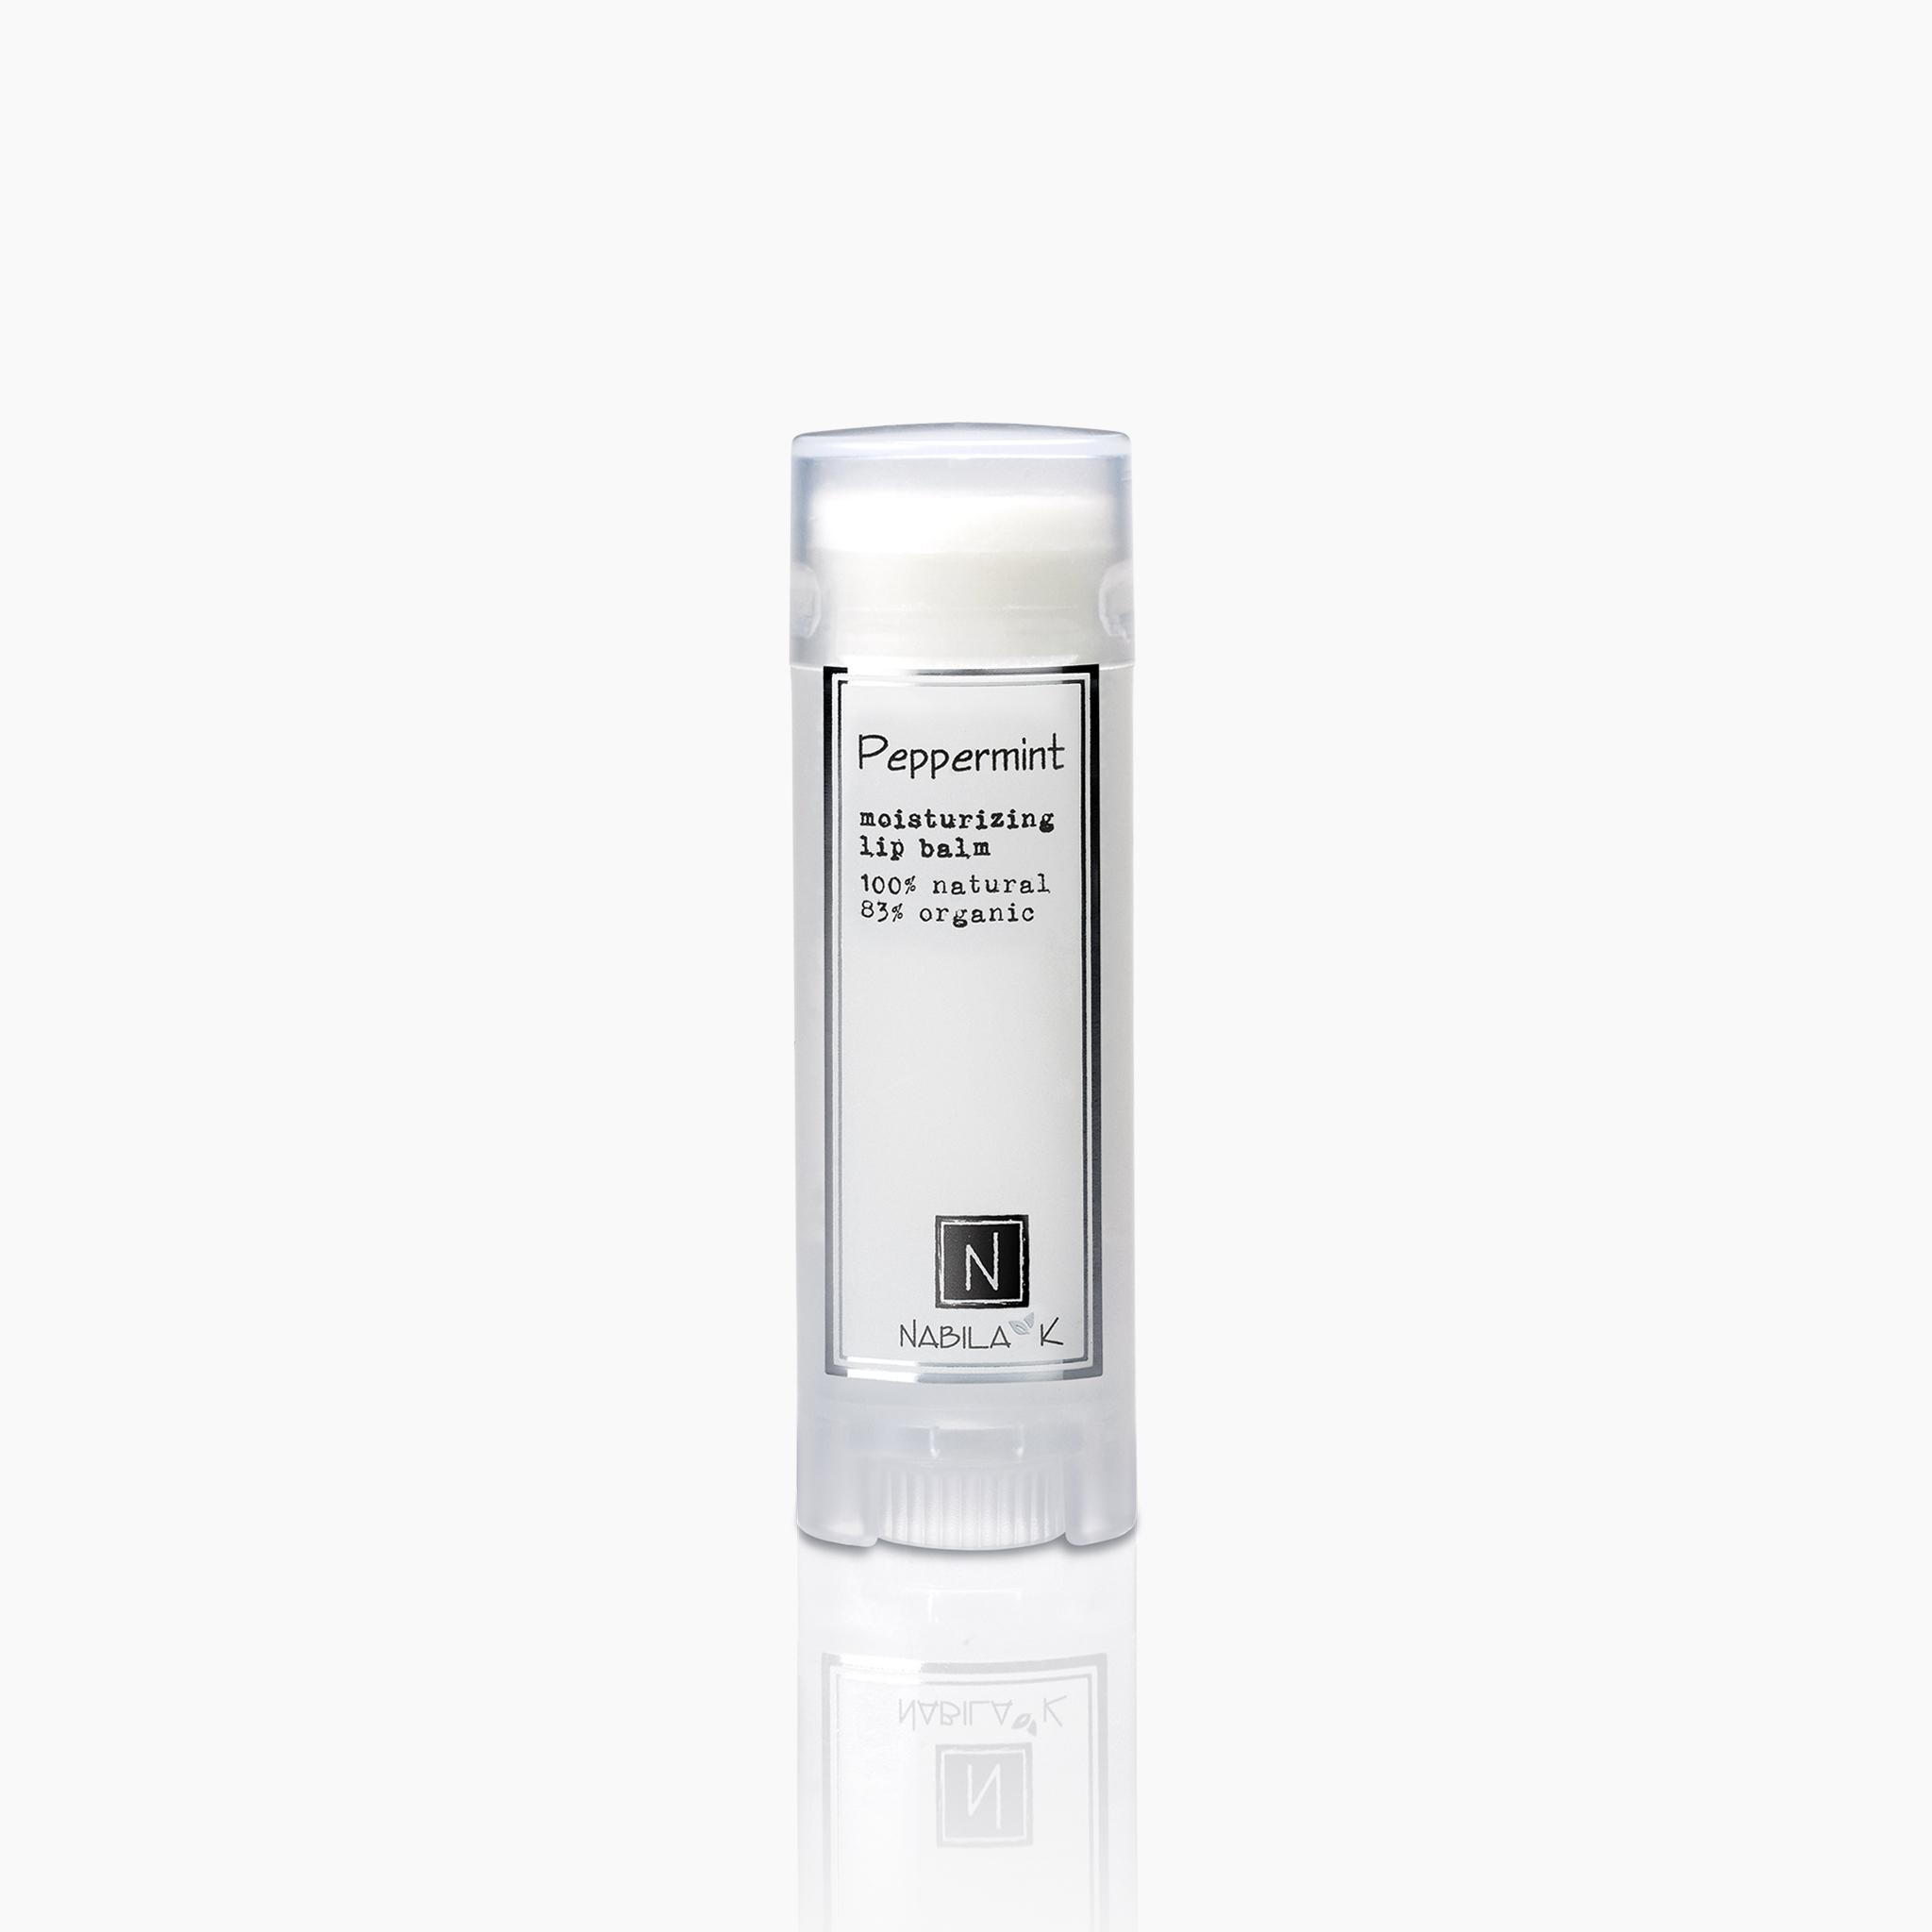 peppermint moisturizing lip balm 100% natural 85% organic